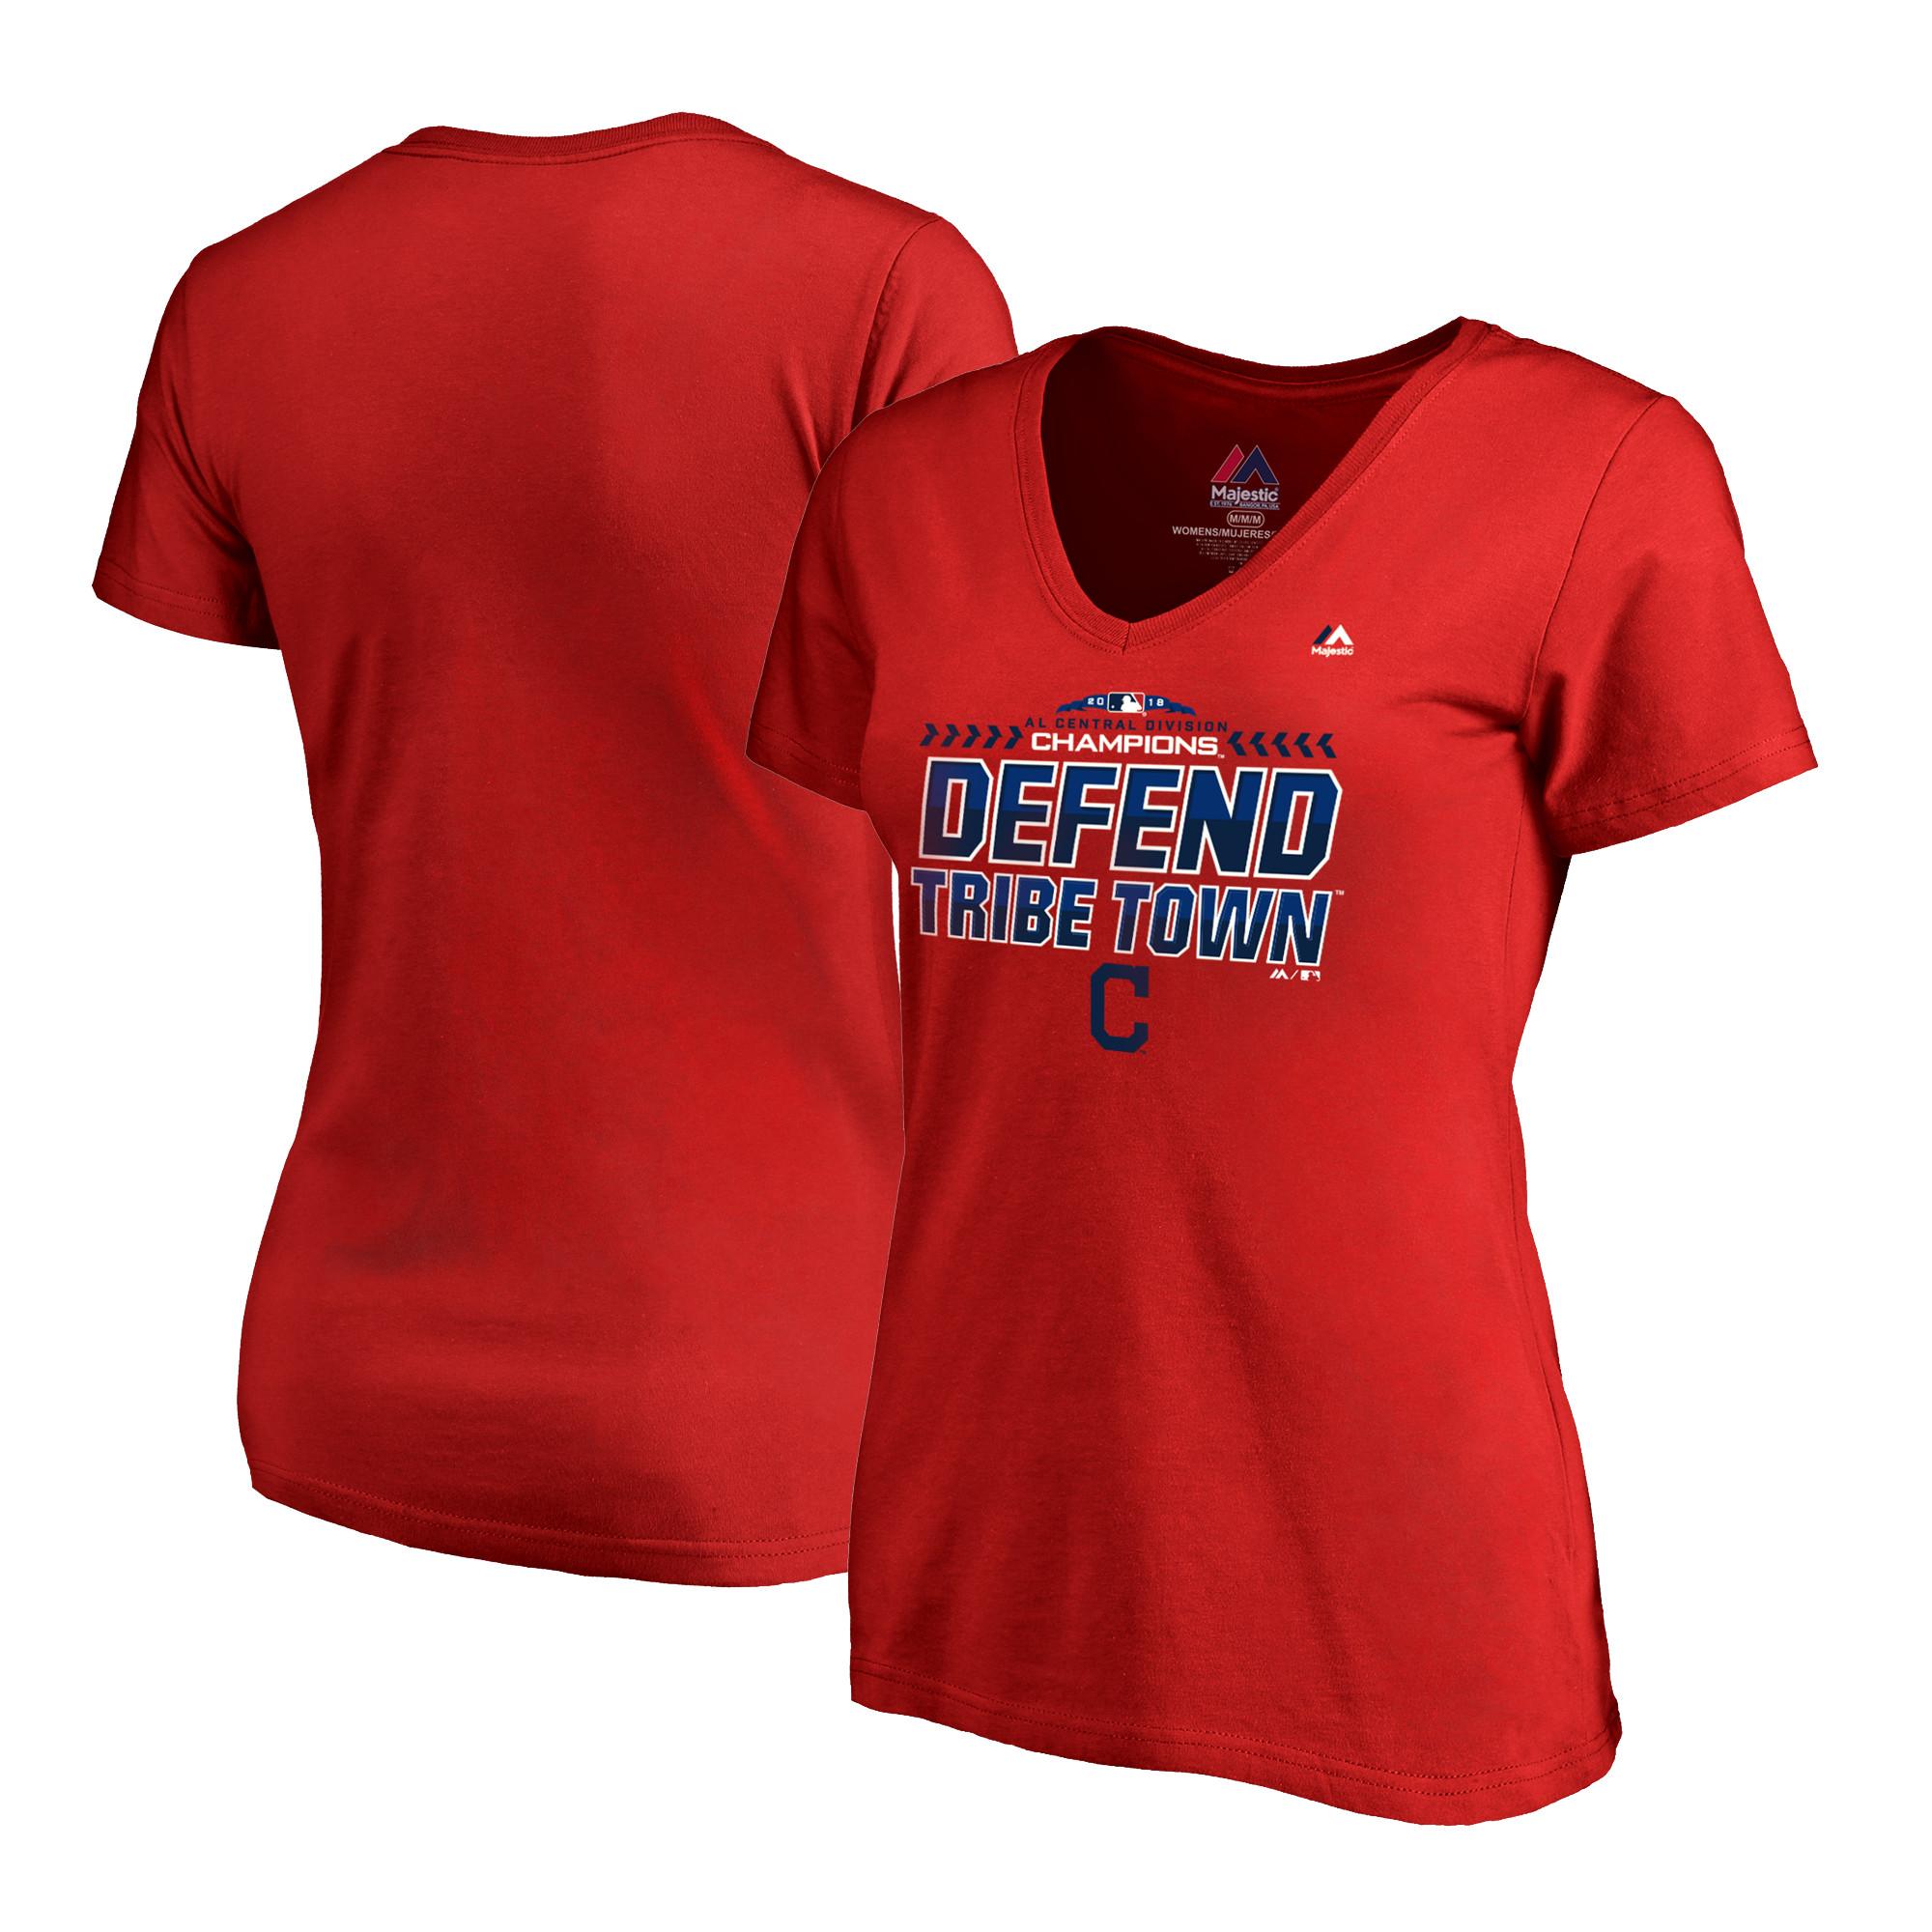 Cleveland Indians Majestic Women's 2018 AL Central Division Champions Locker Room Defend Plus Size V-Neck T-Shirt - Red